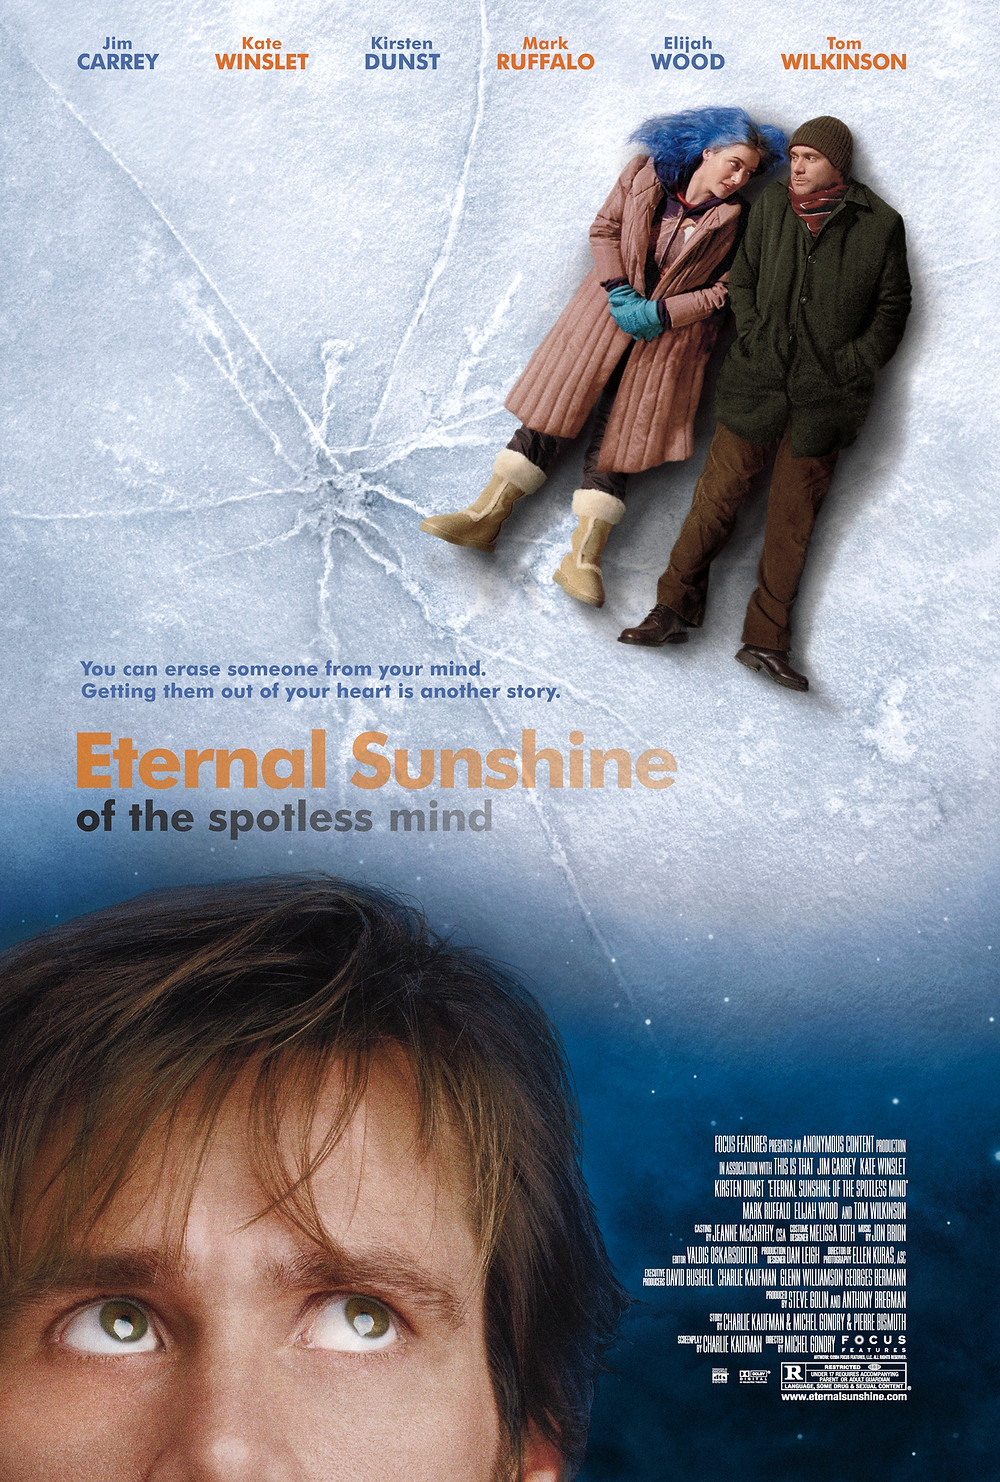 eternal sunshine of the spotless mind movie poster 电影海报